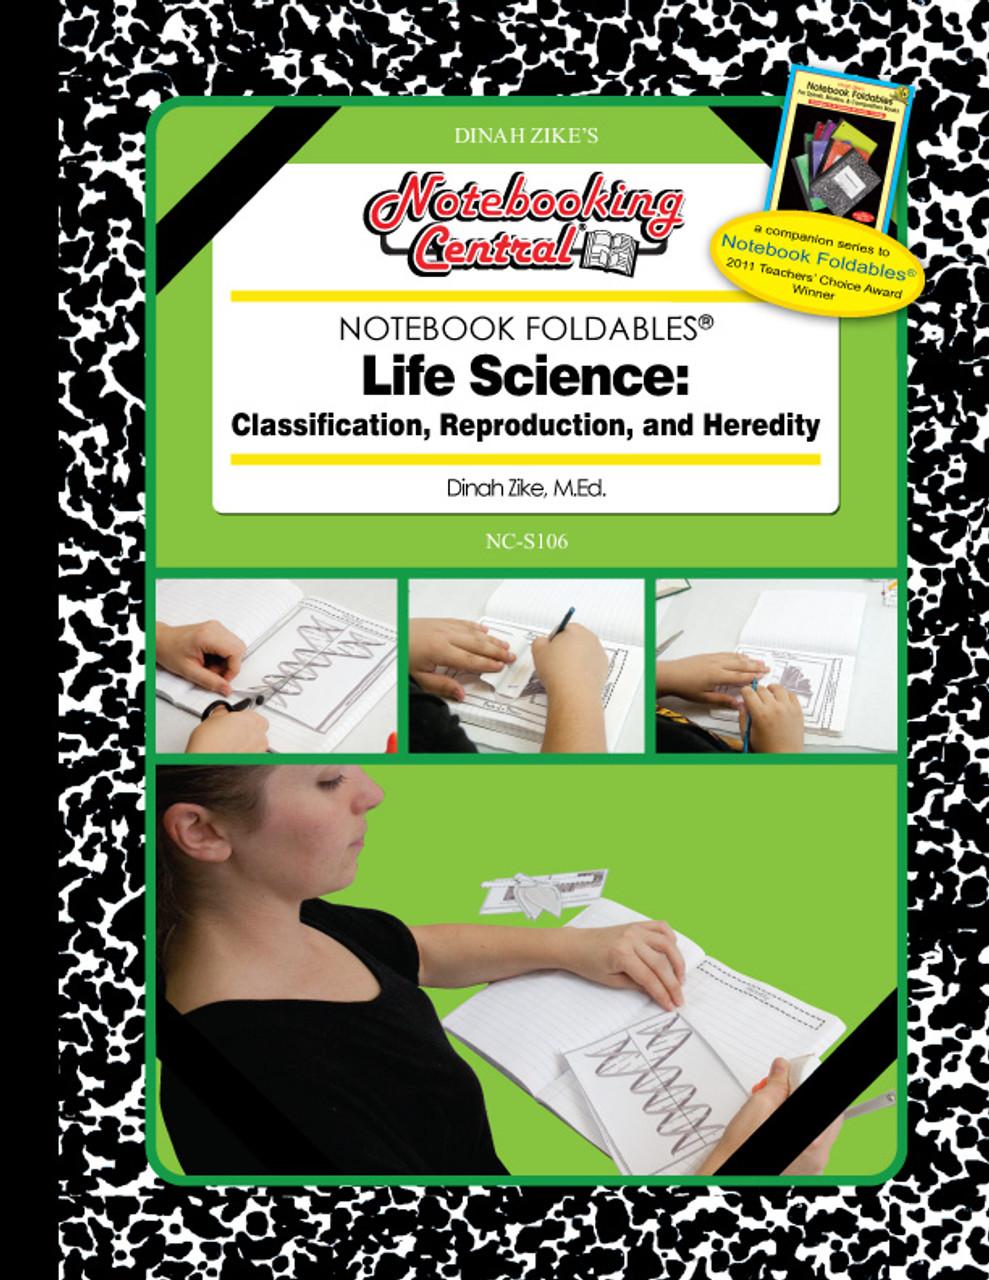 Nc lifescience2 class oct3 final layout 1 (page 02)